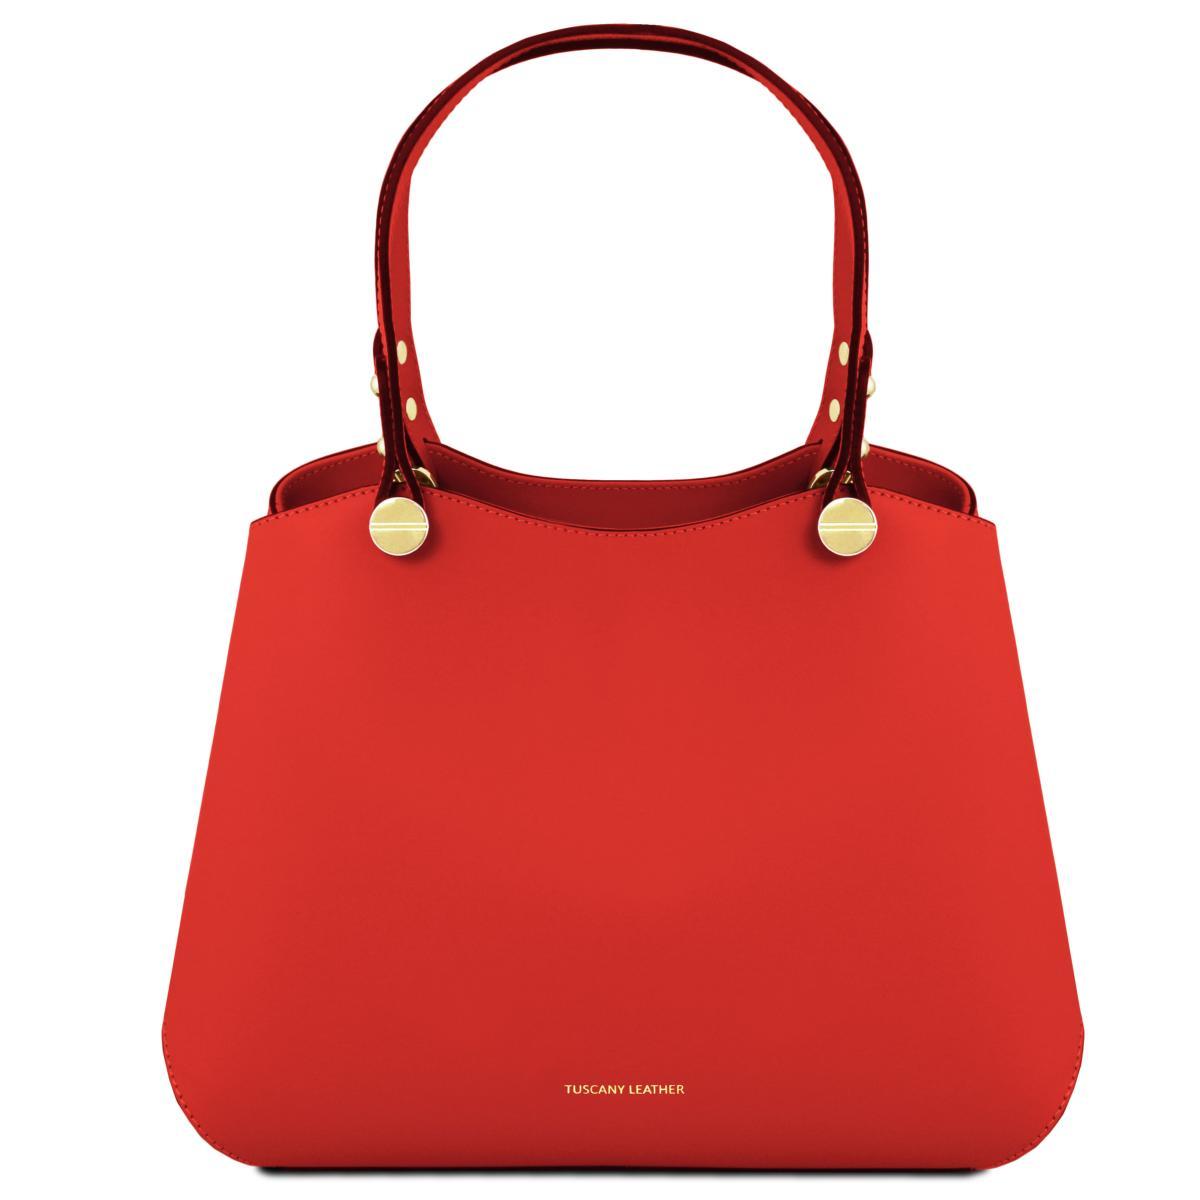 solde sac cuir femme 2 compartiments tuscany leather. Black Bedroom Furniture Sets. Home Design Ideas